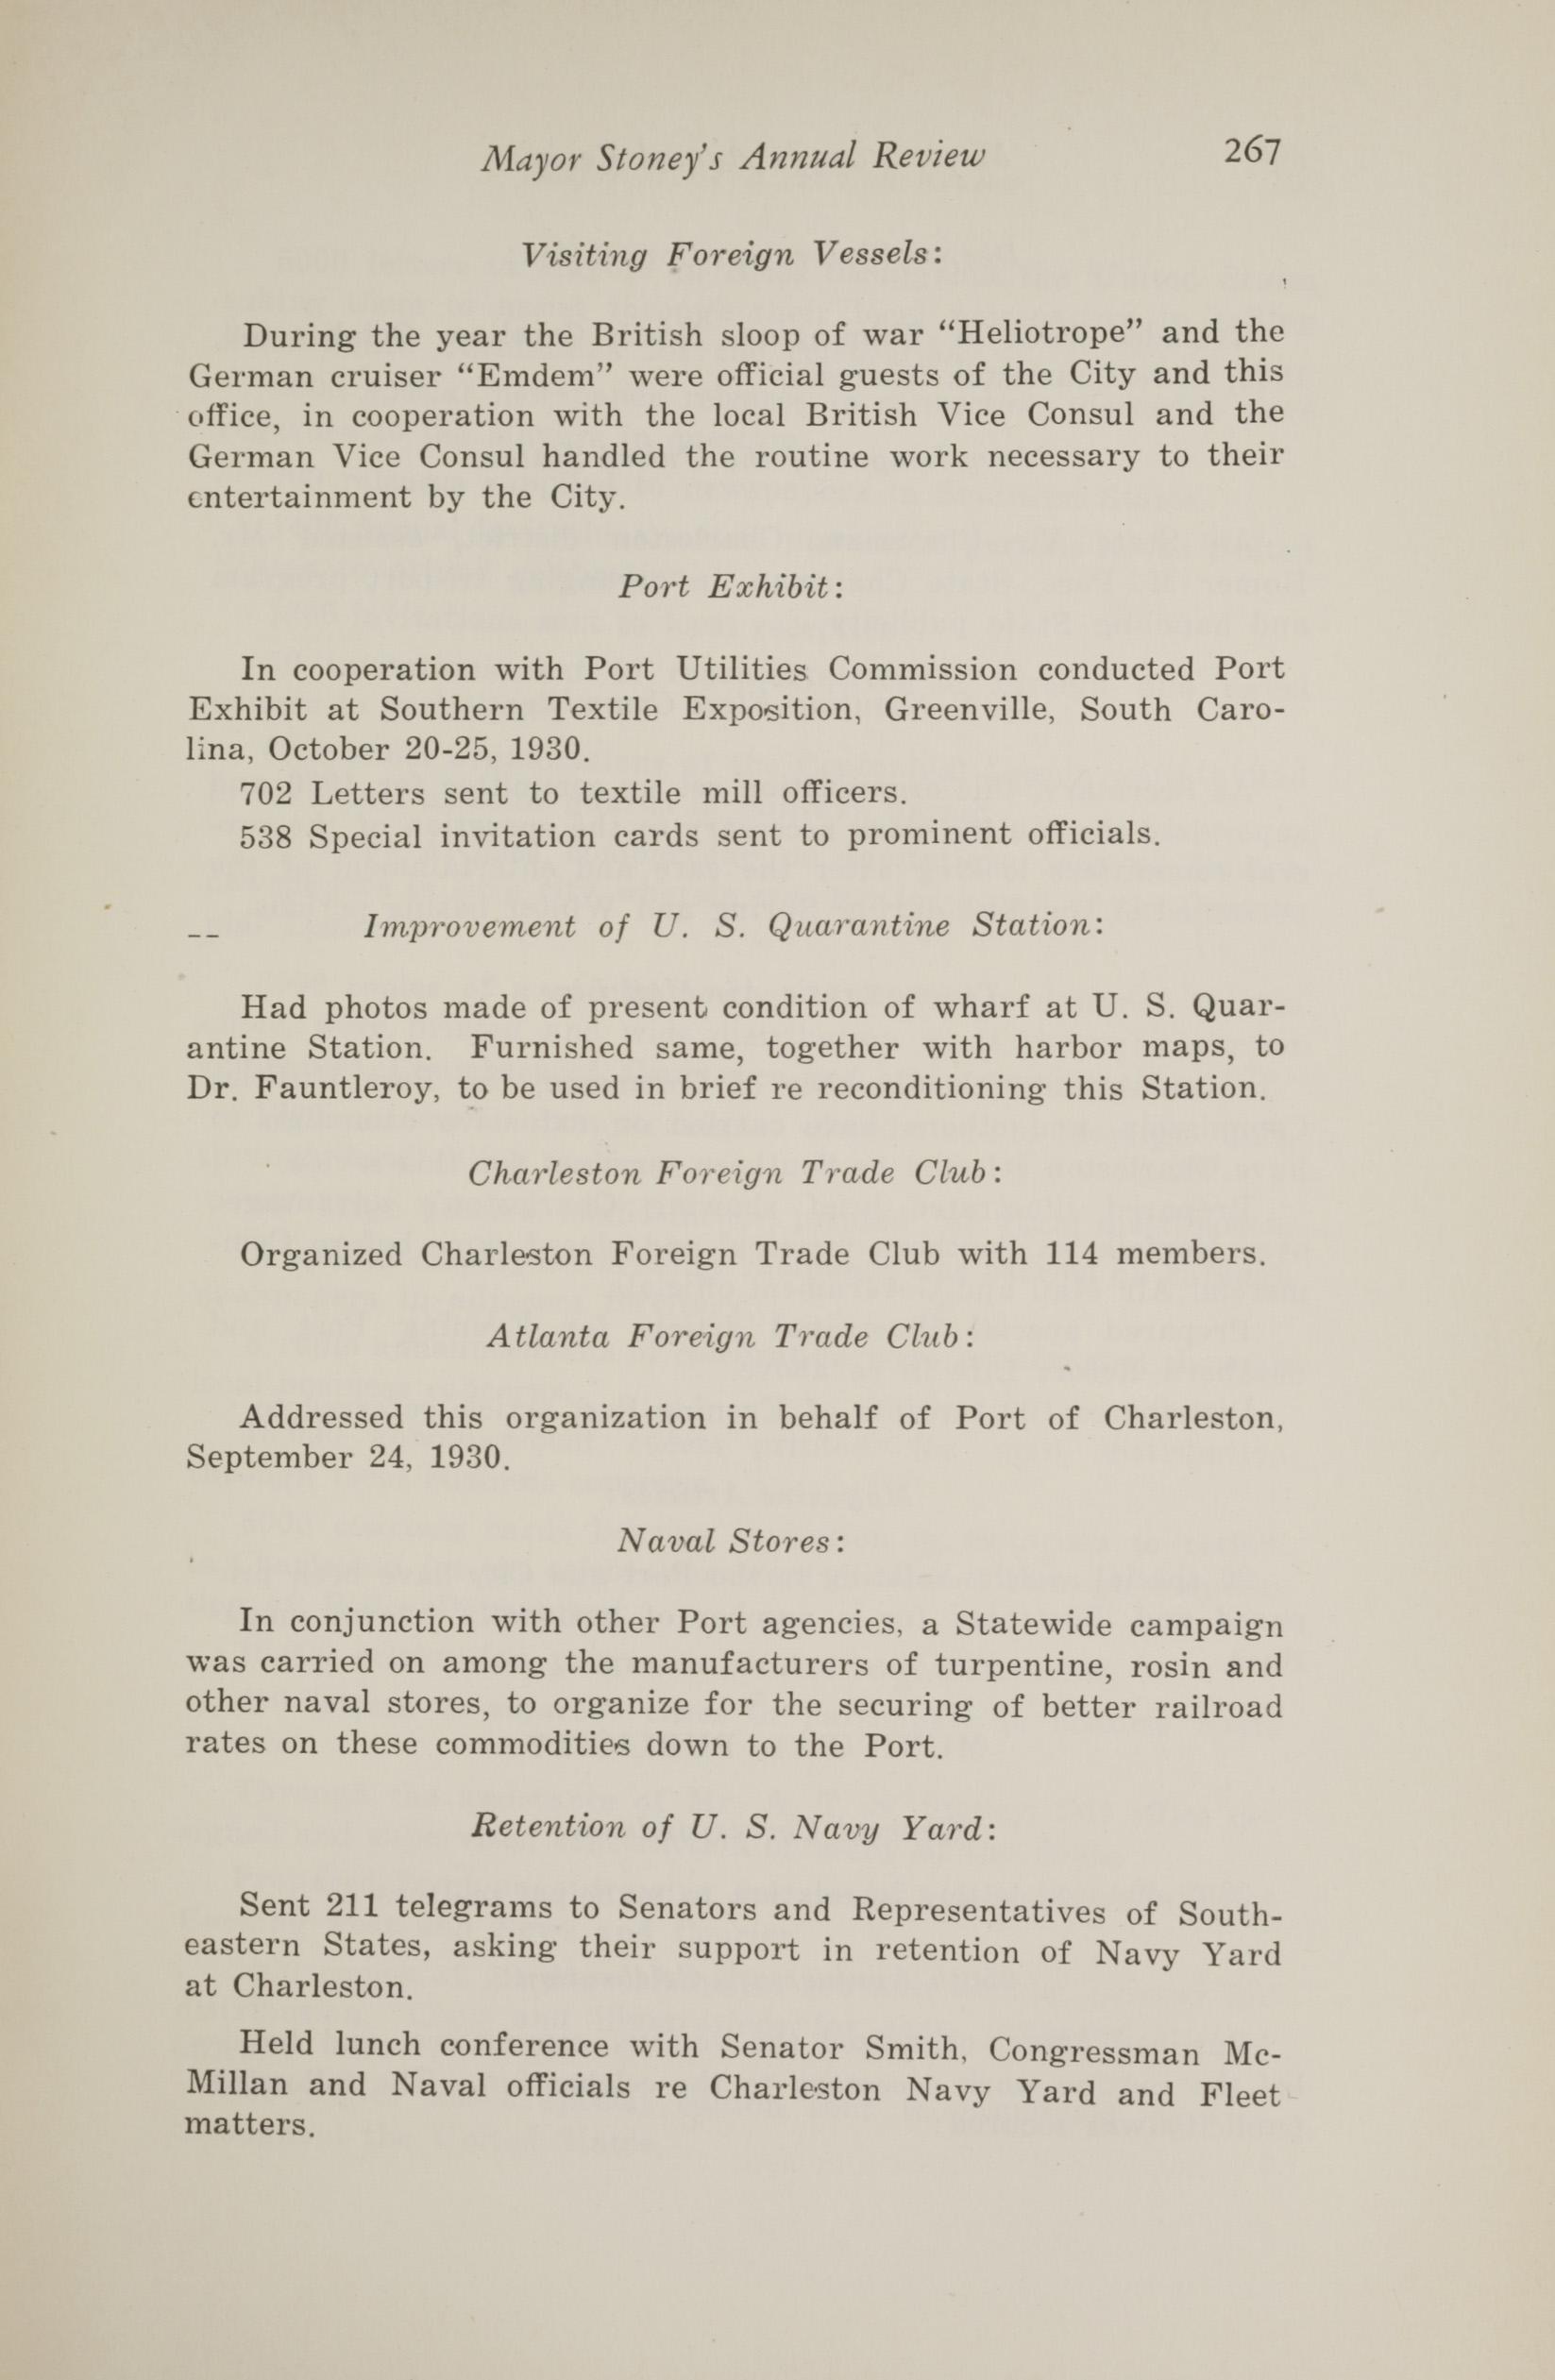 Charleston Yearbook, 1930, page 267